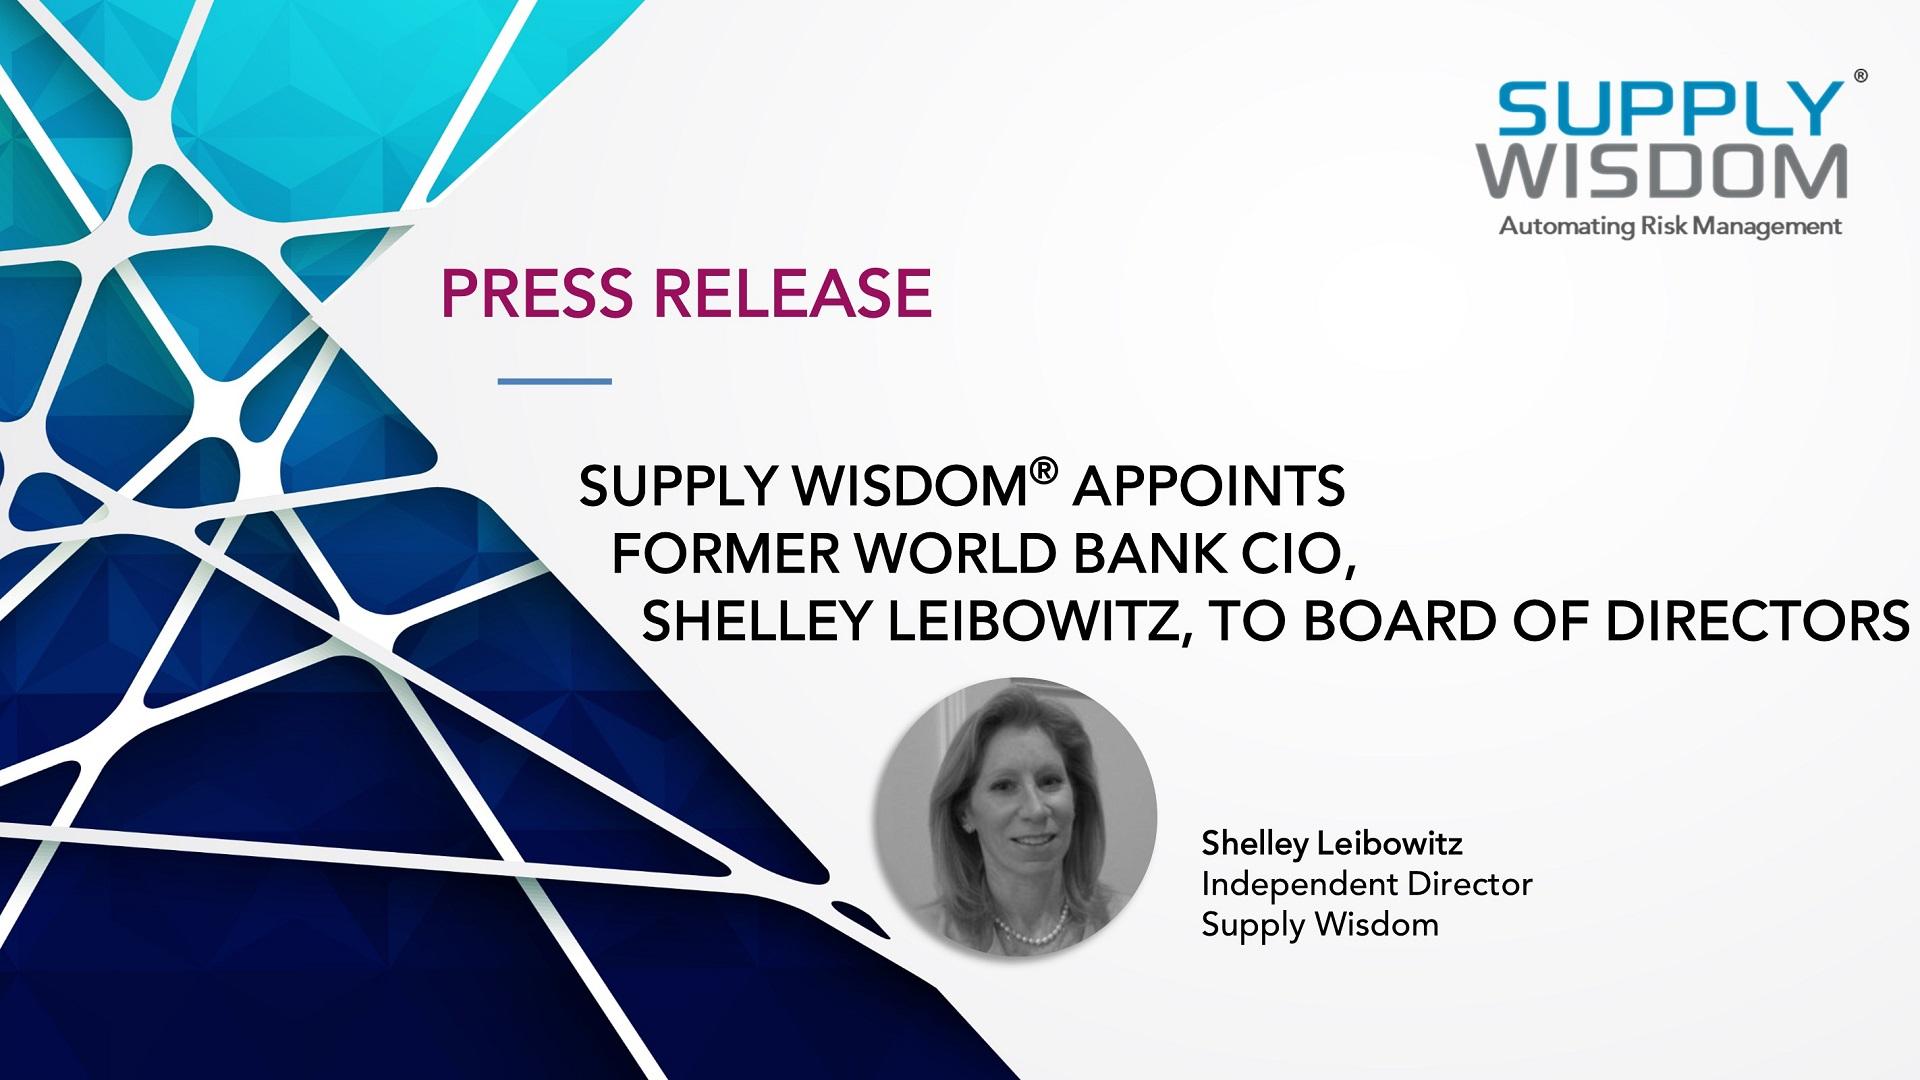 Former World Bank CIO Shelley Leibowitz joins Supply Wisdom Board of Directors